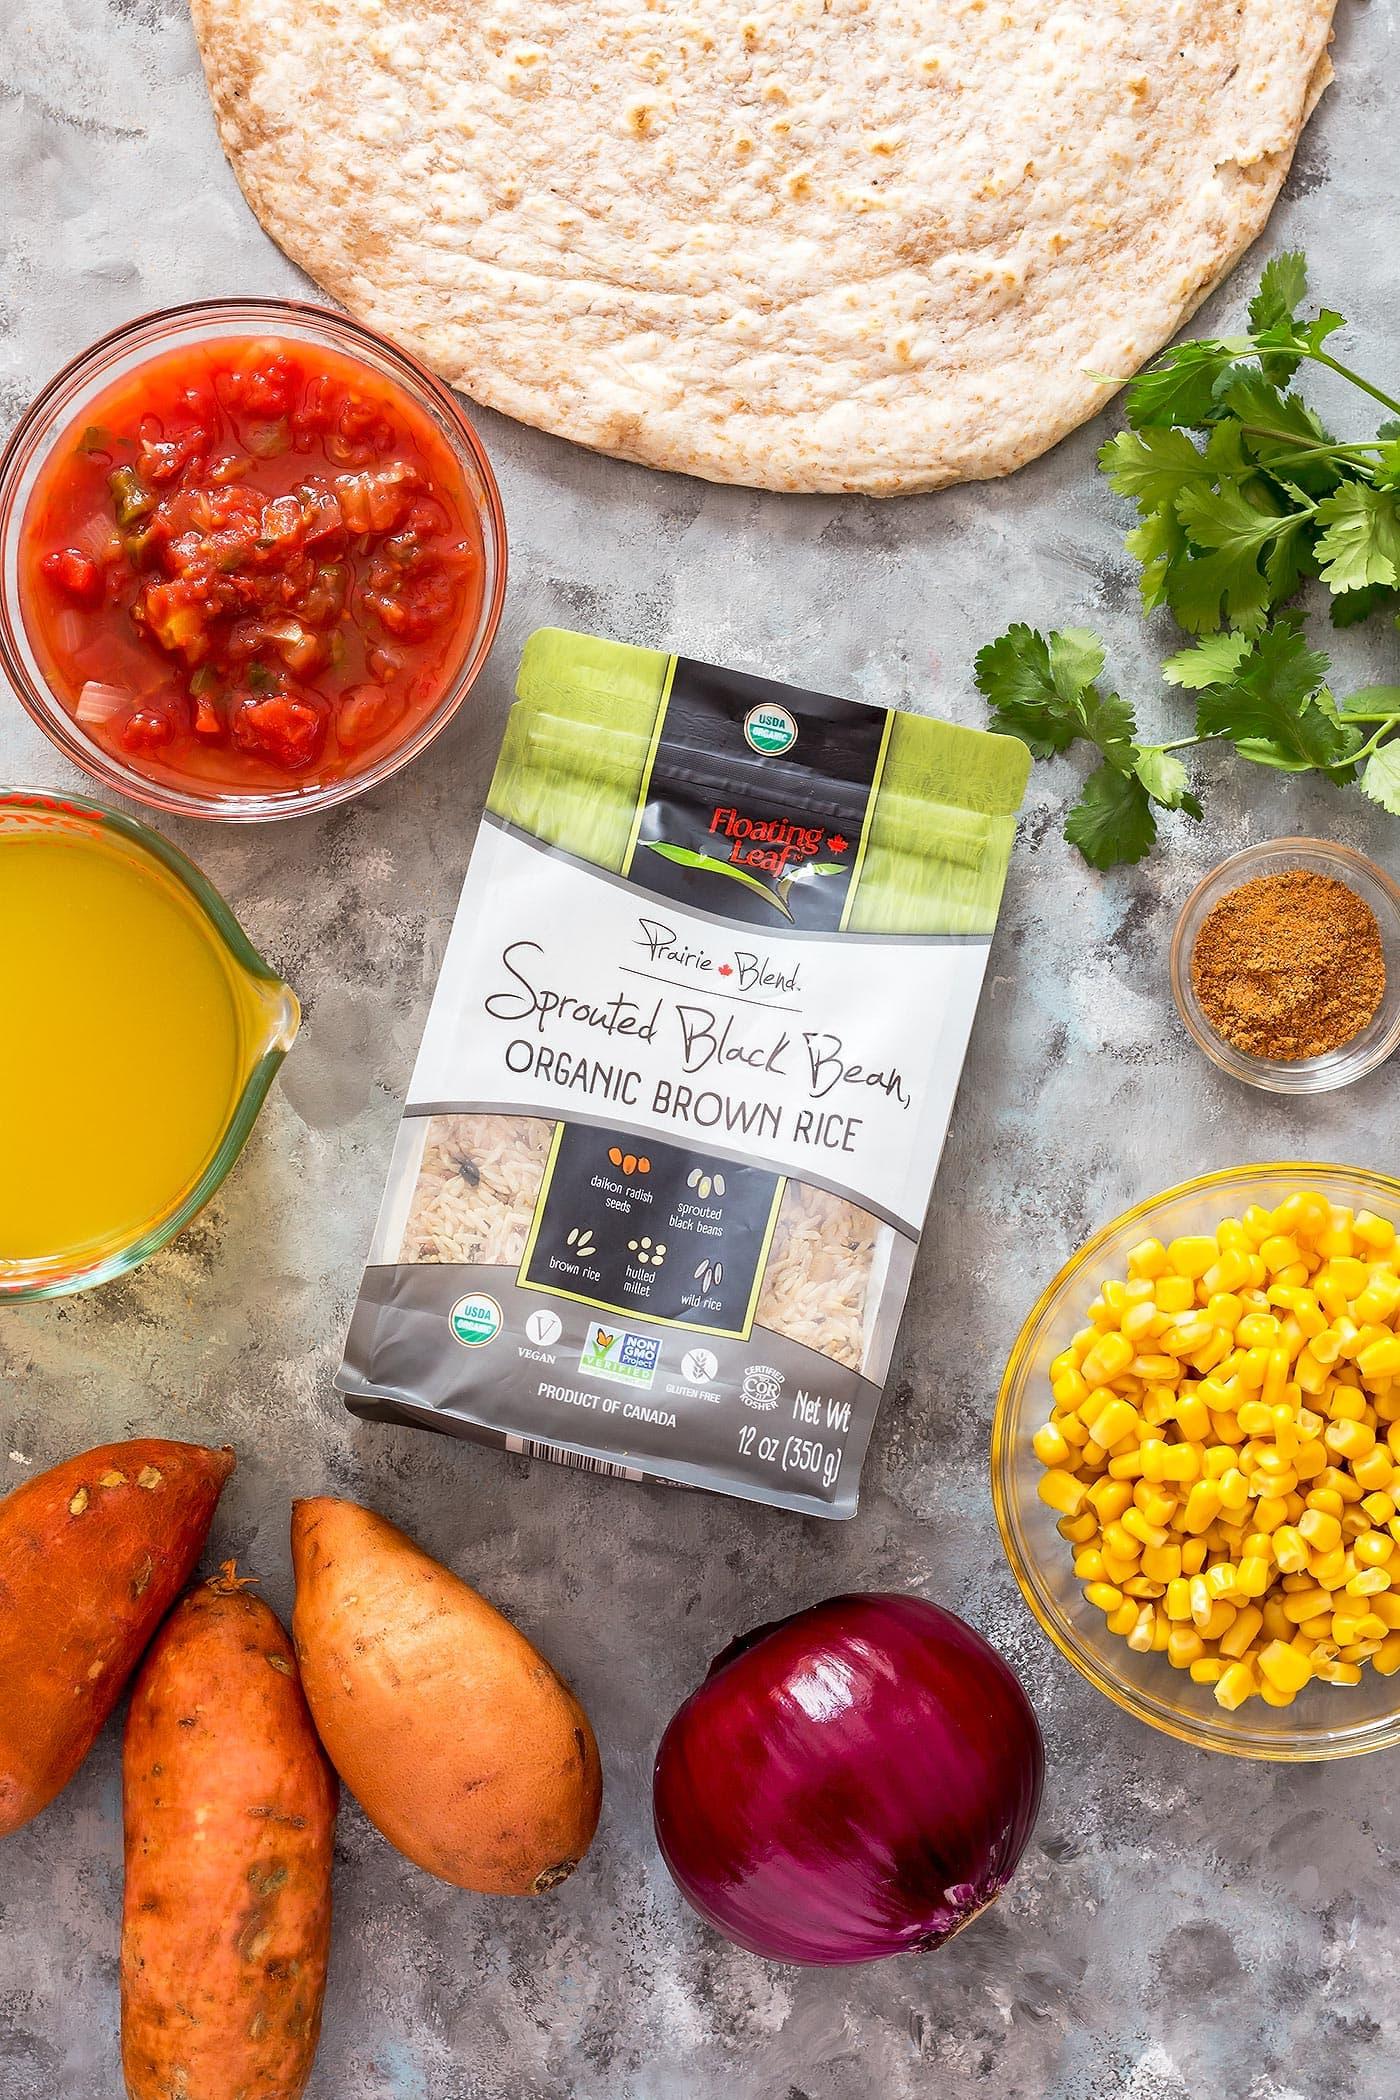 Ingredients for vegan burritos